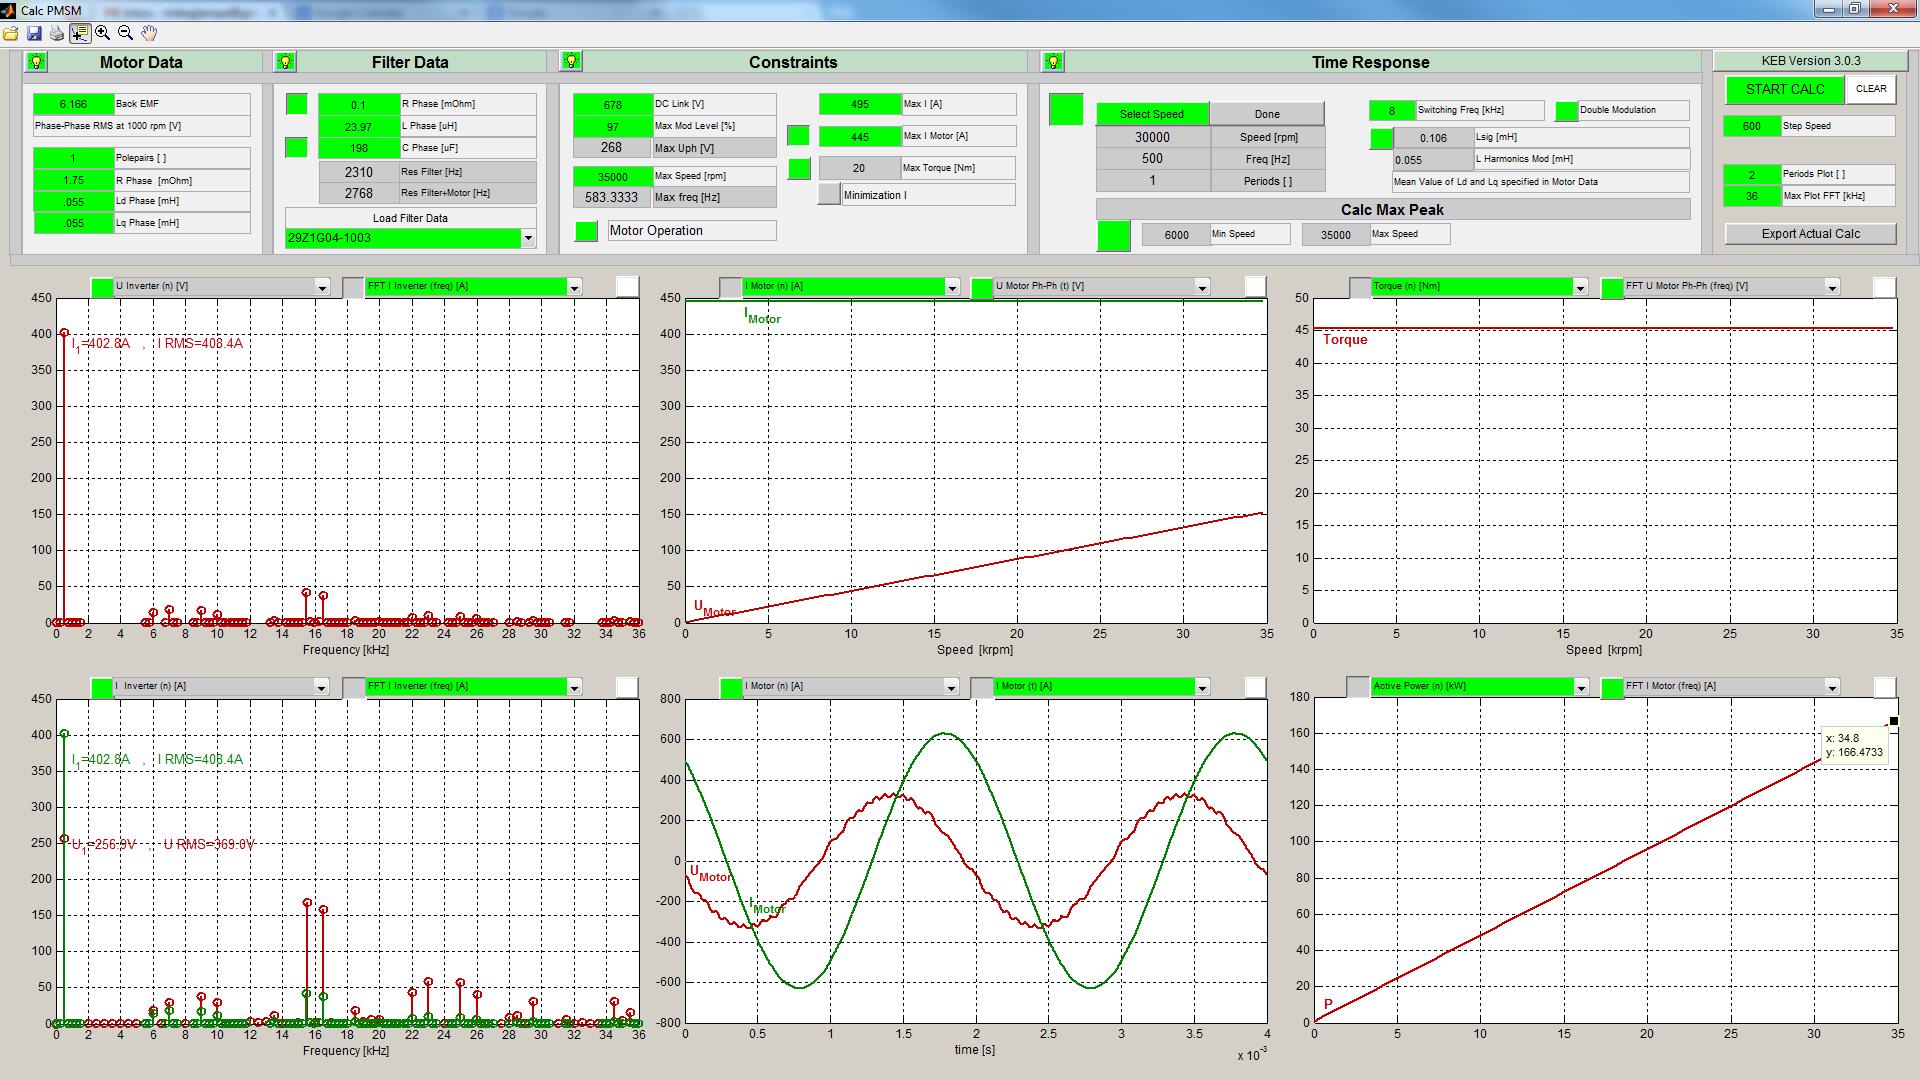 HIL VFD high speed report